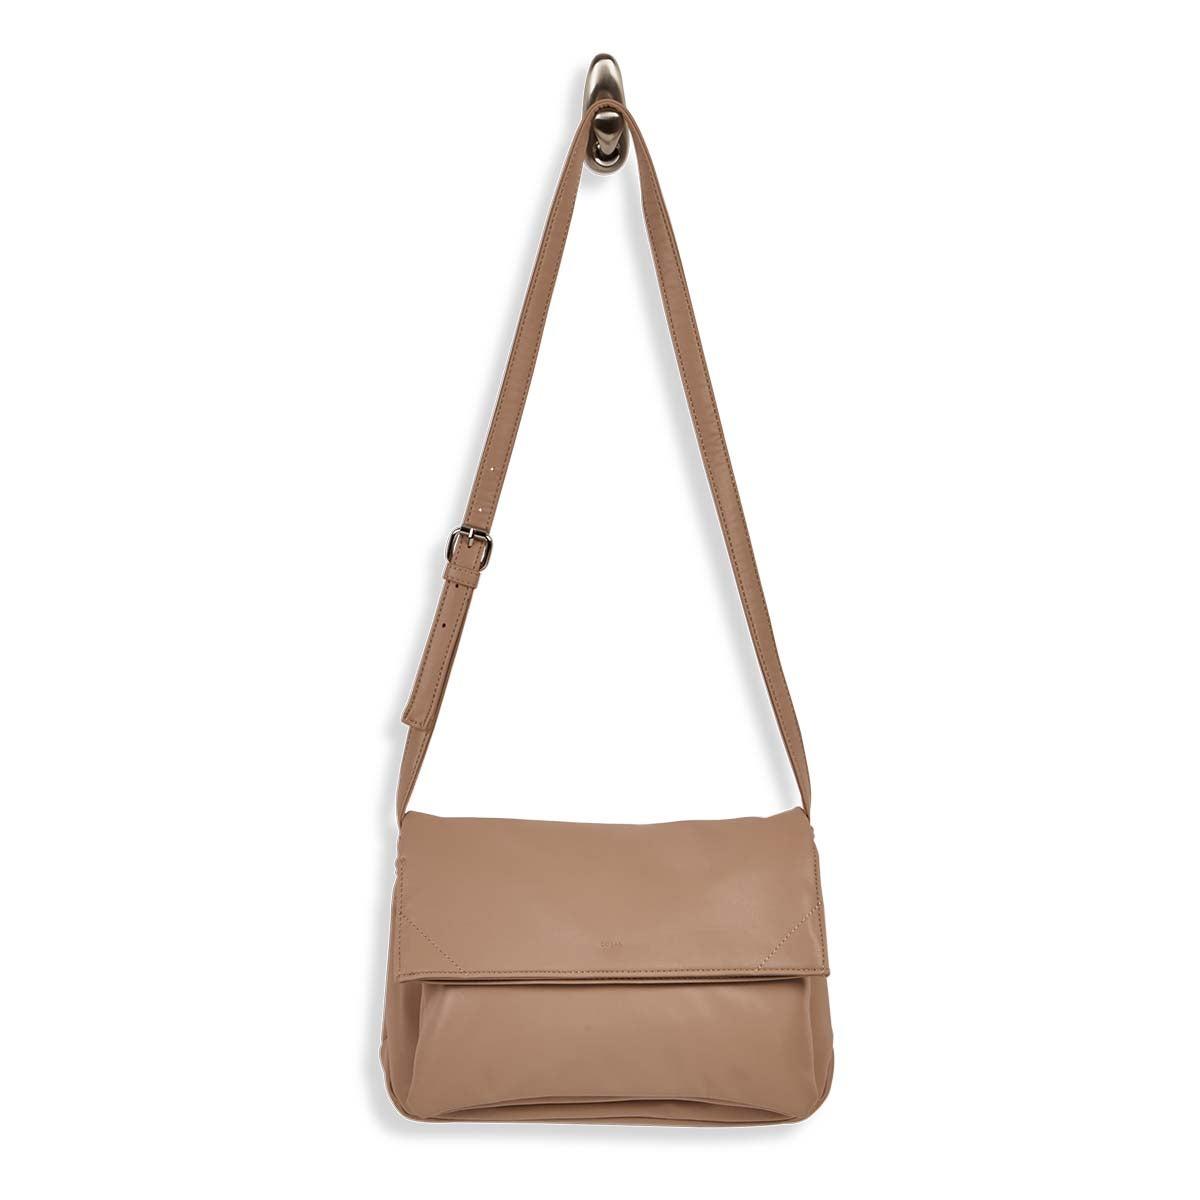 Women's HARLOW foldover beige crossbody bag